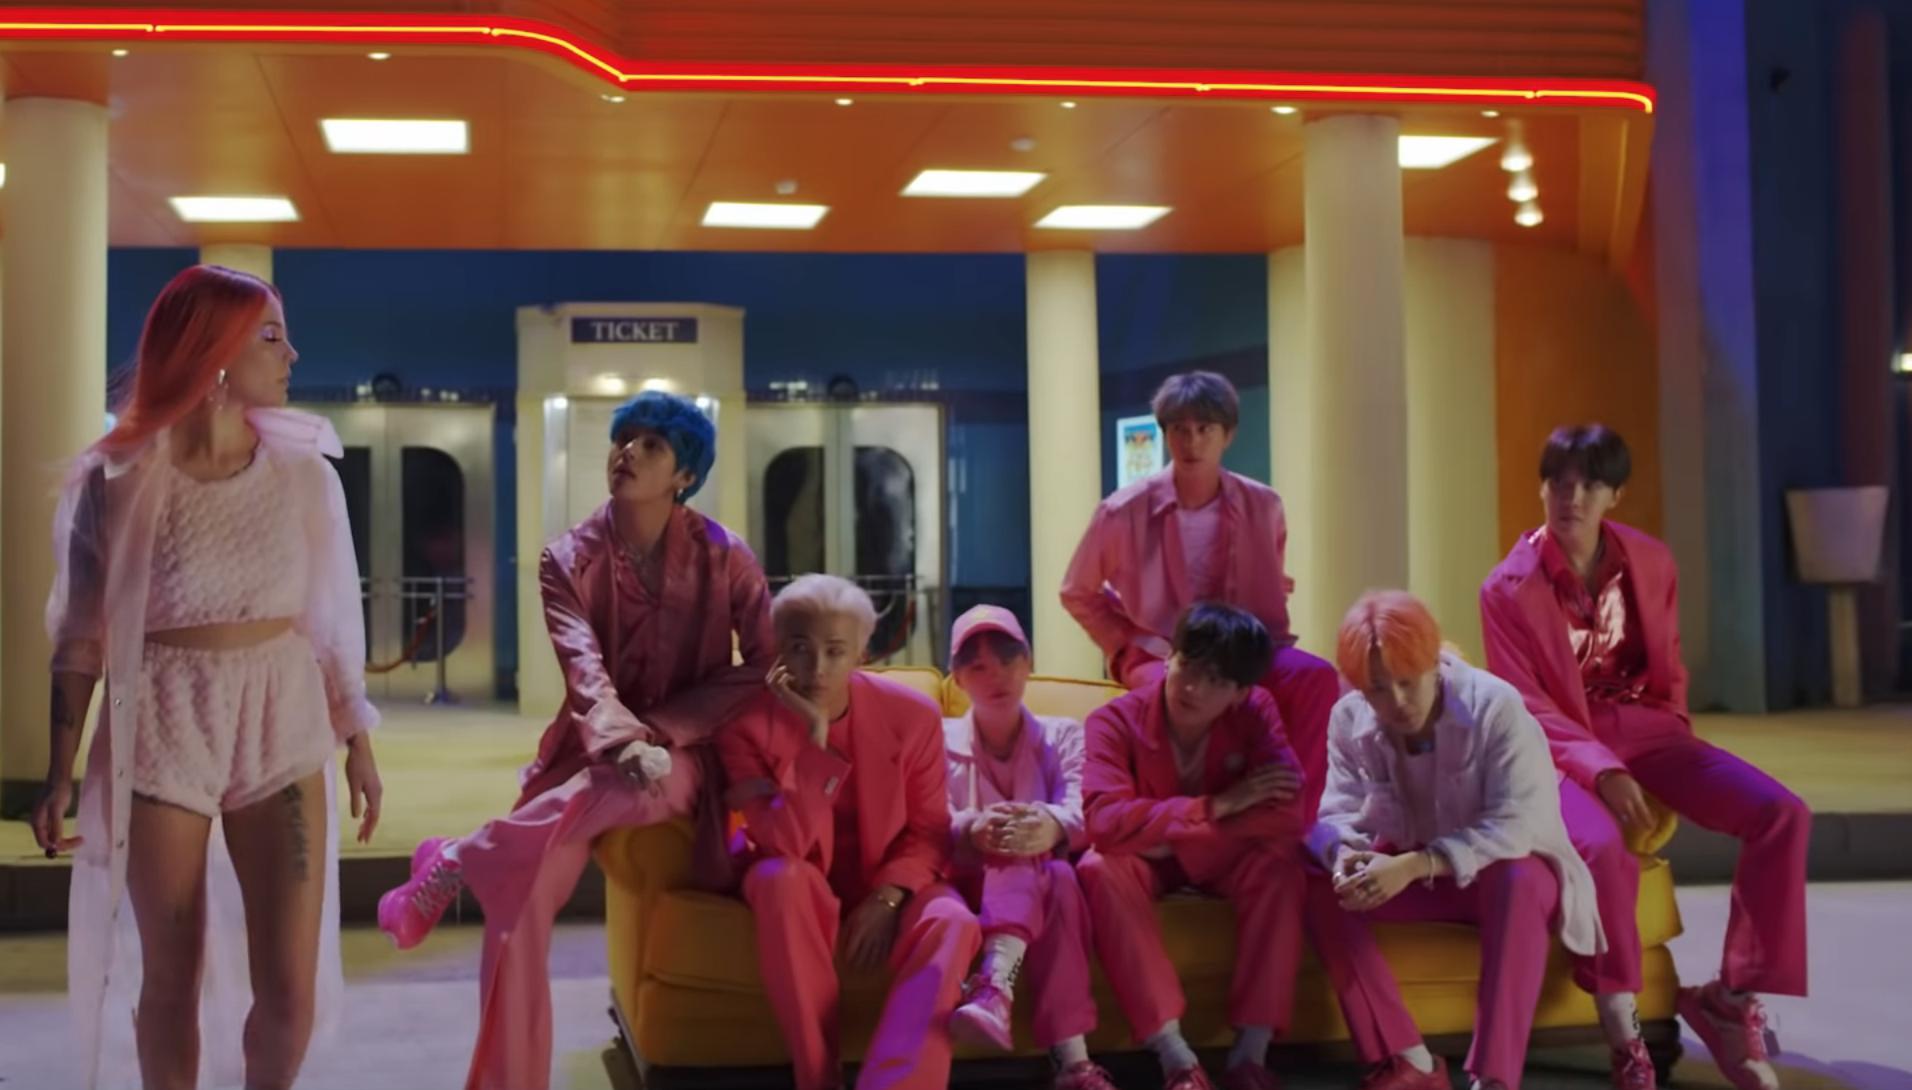 BTS Announces New Single Boy With Luv Unveil Teaser